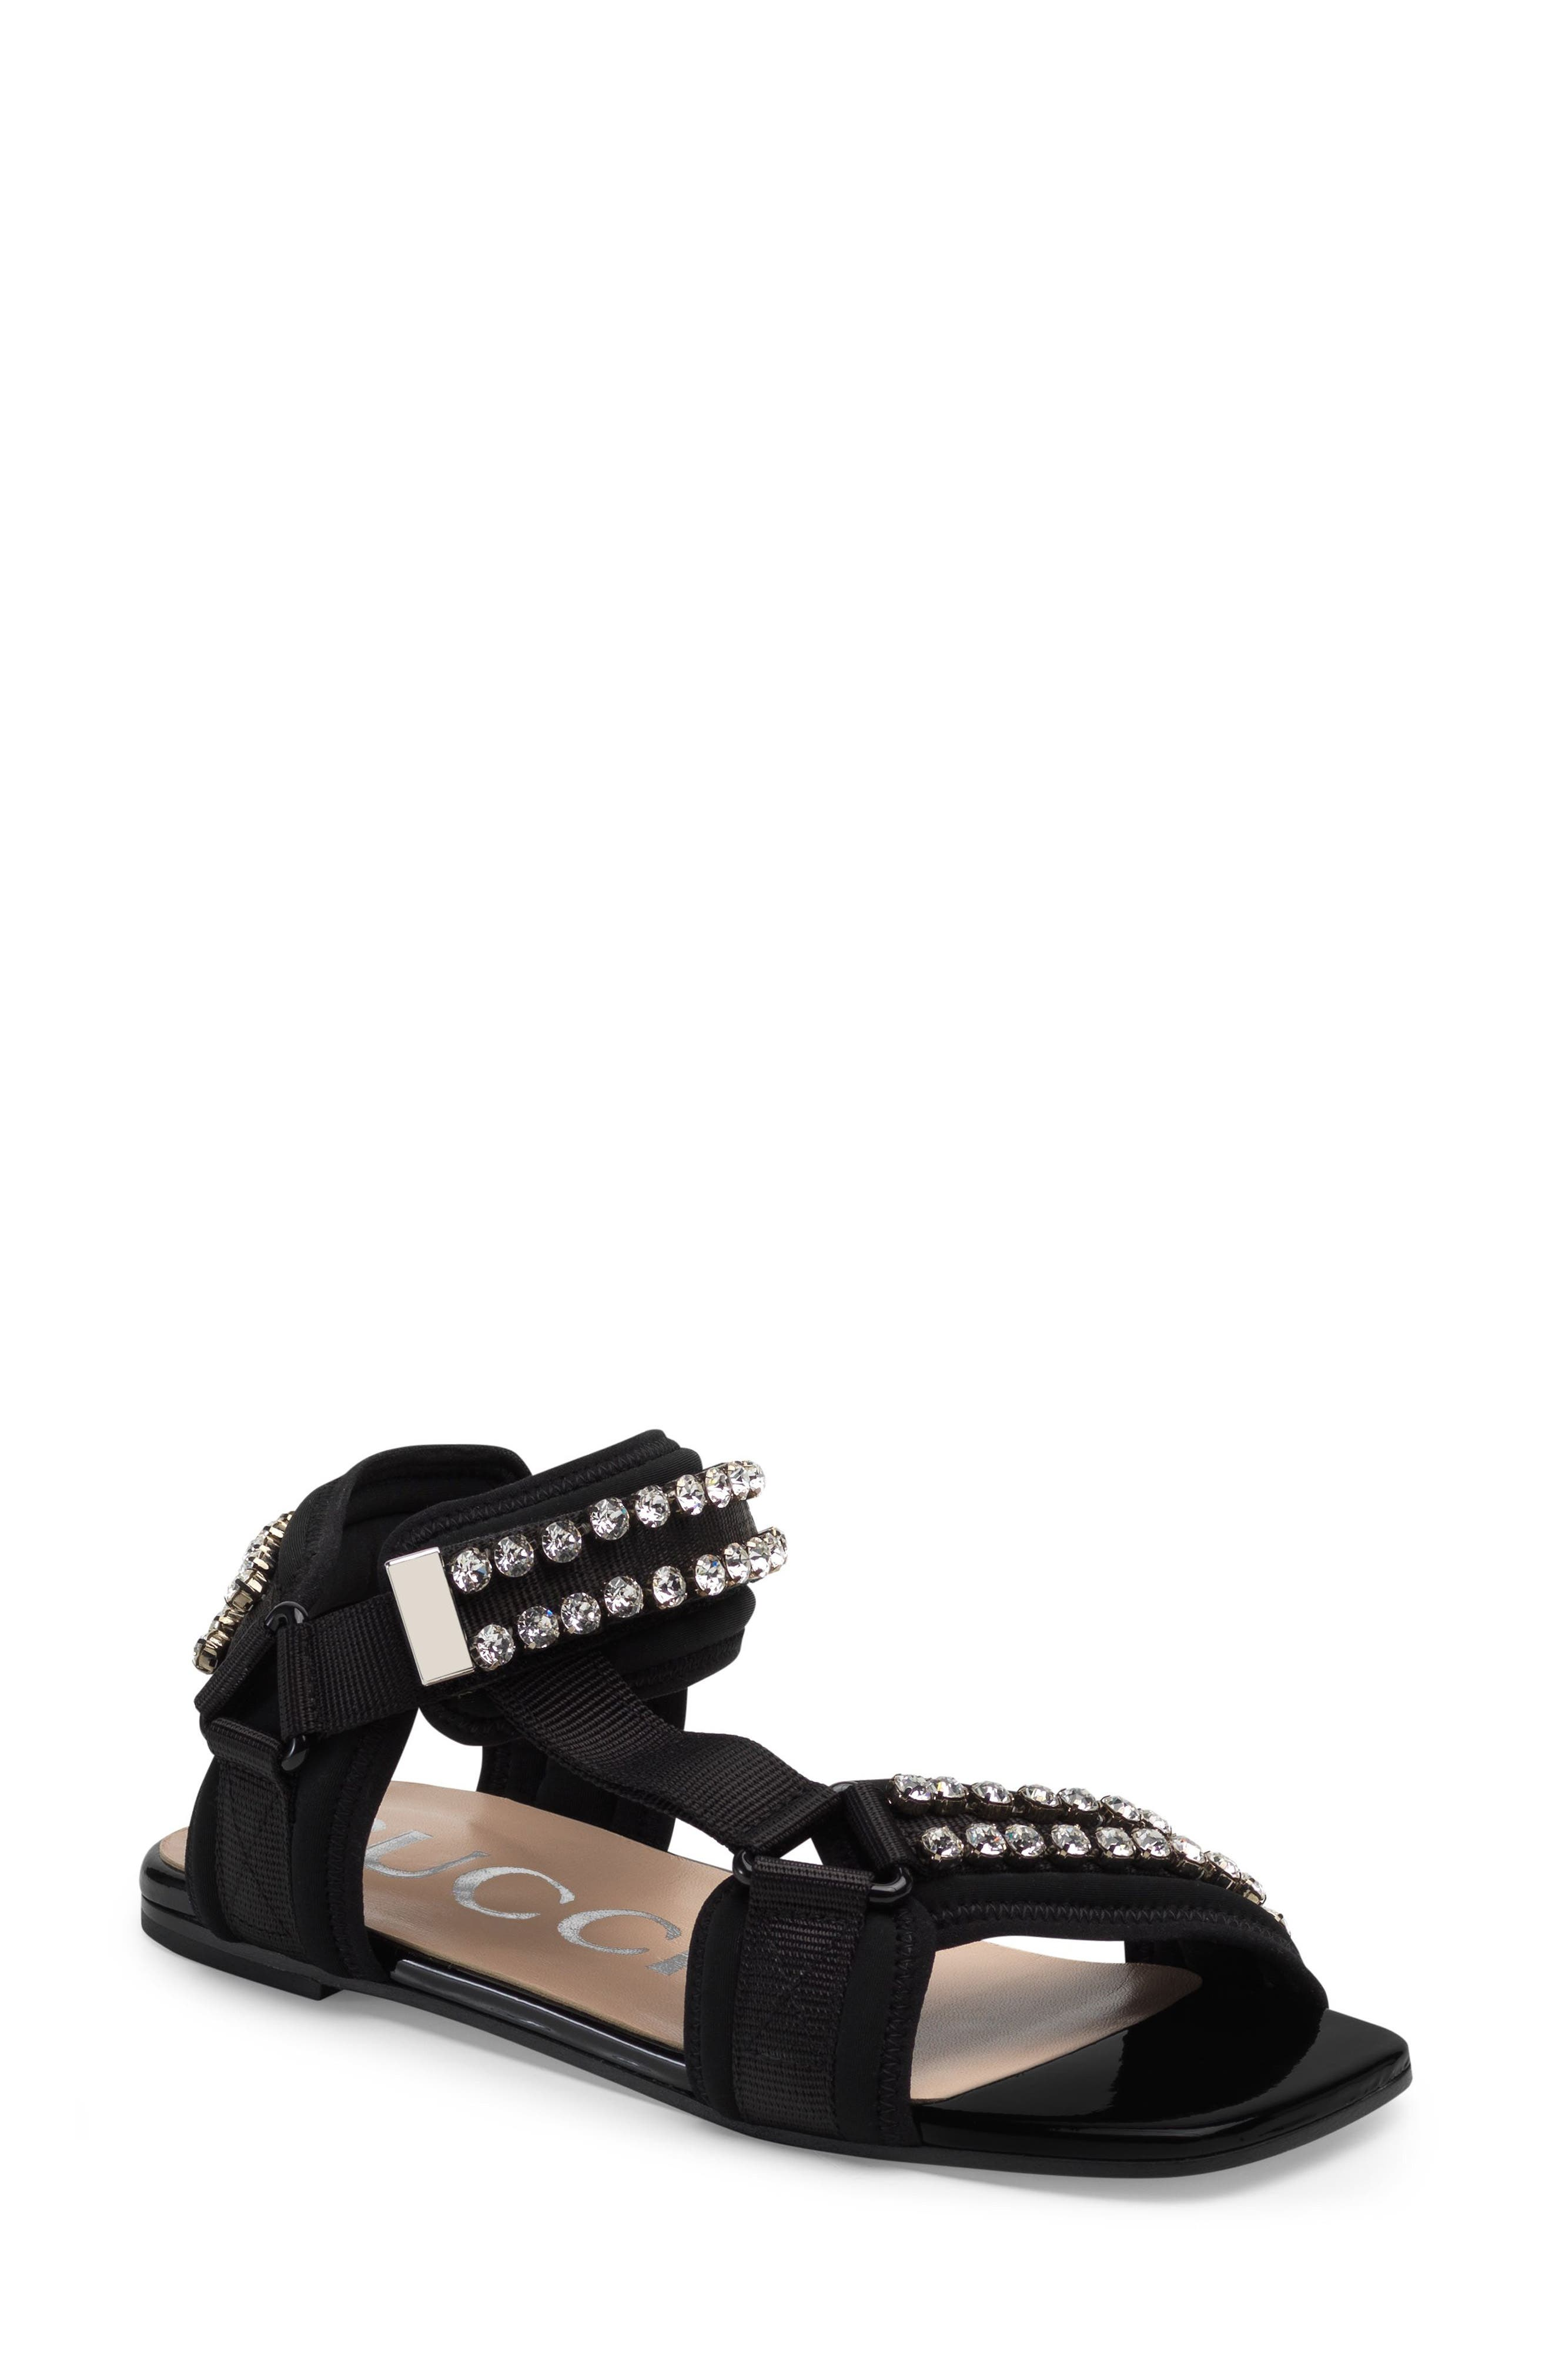 22e36b331f9 Women s Designer Shoes